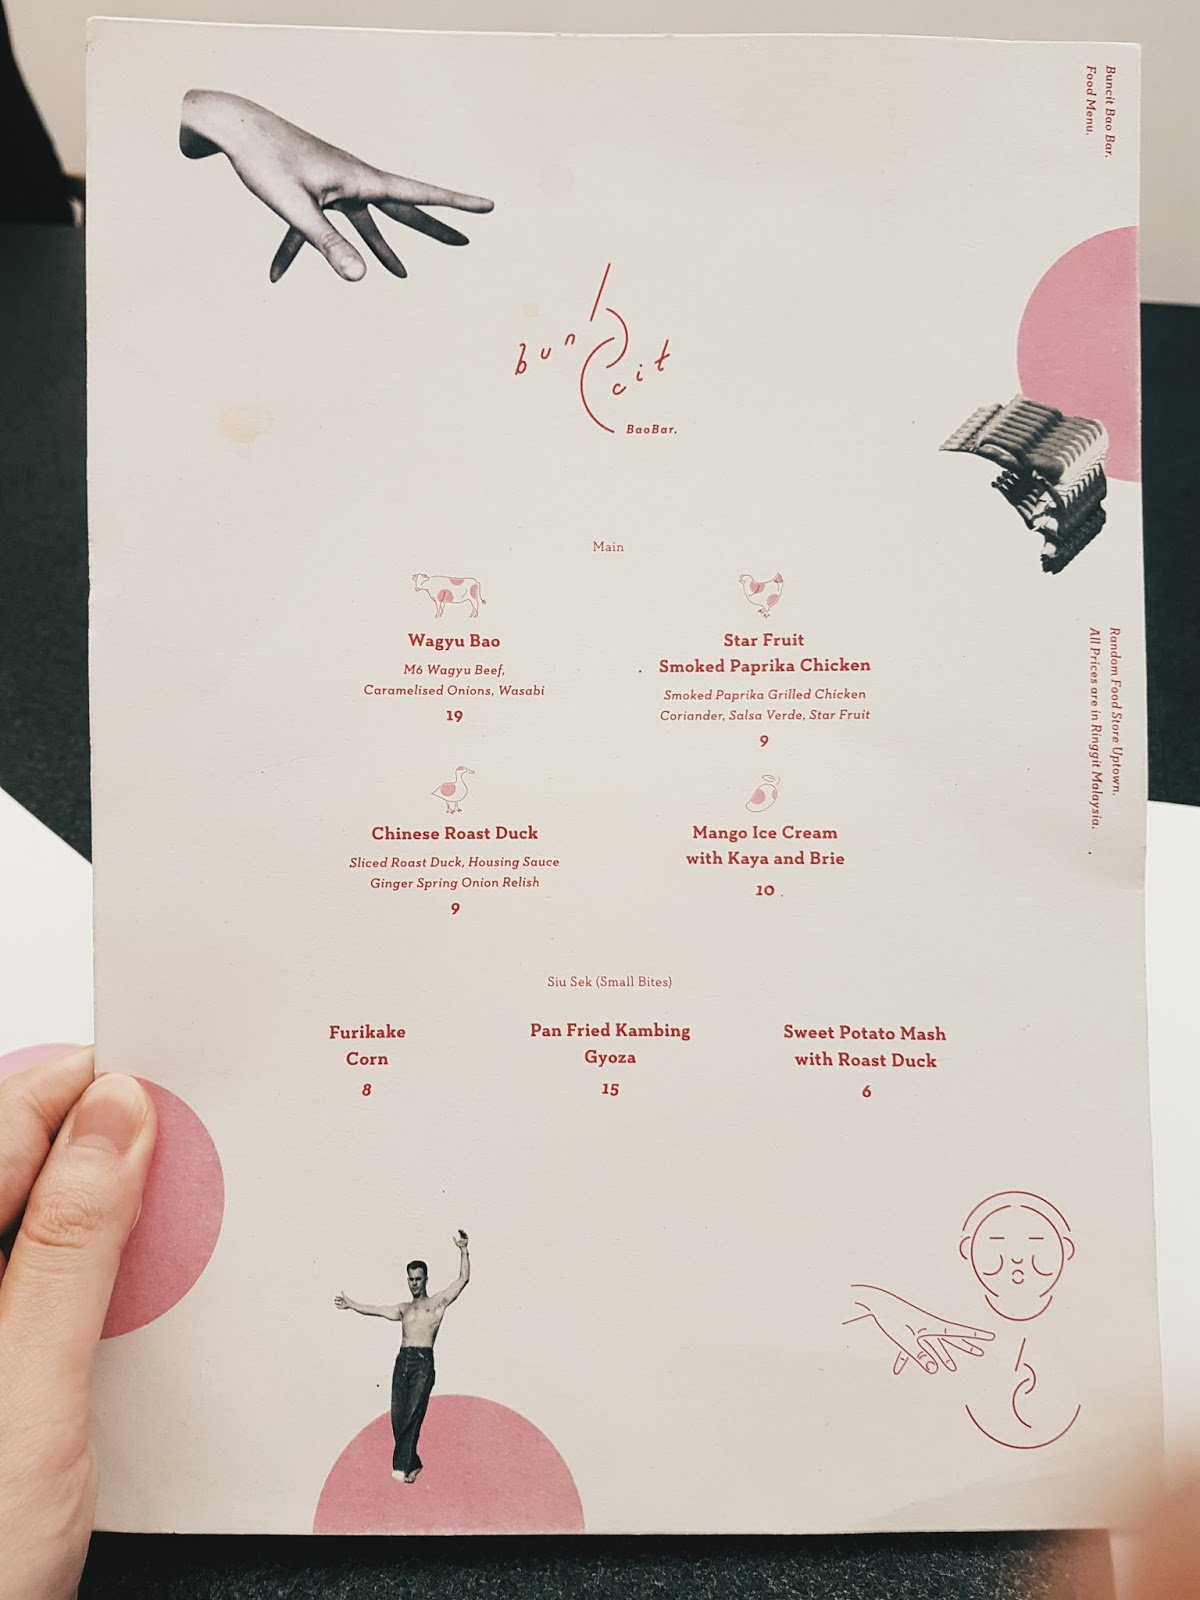 menu and prices